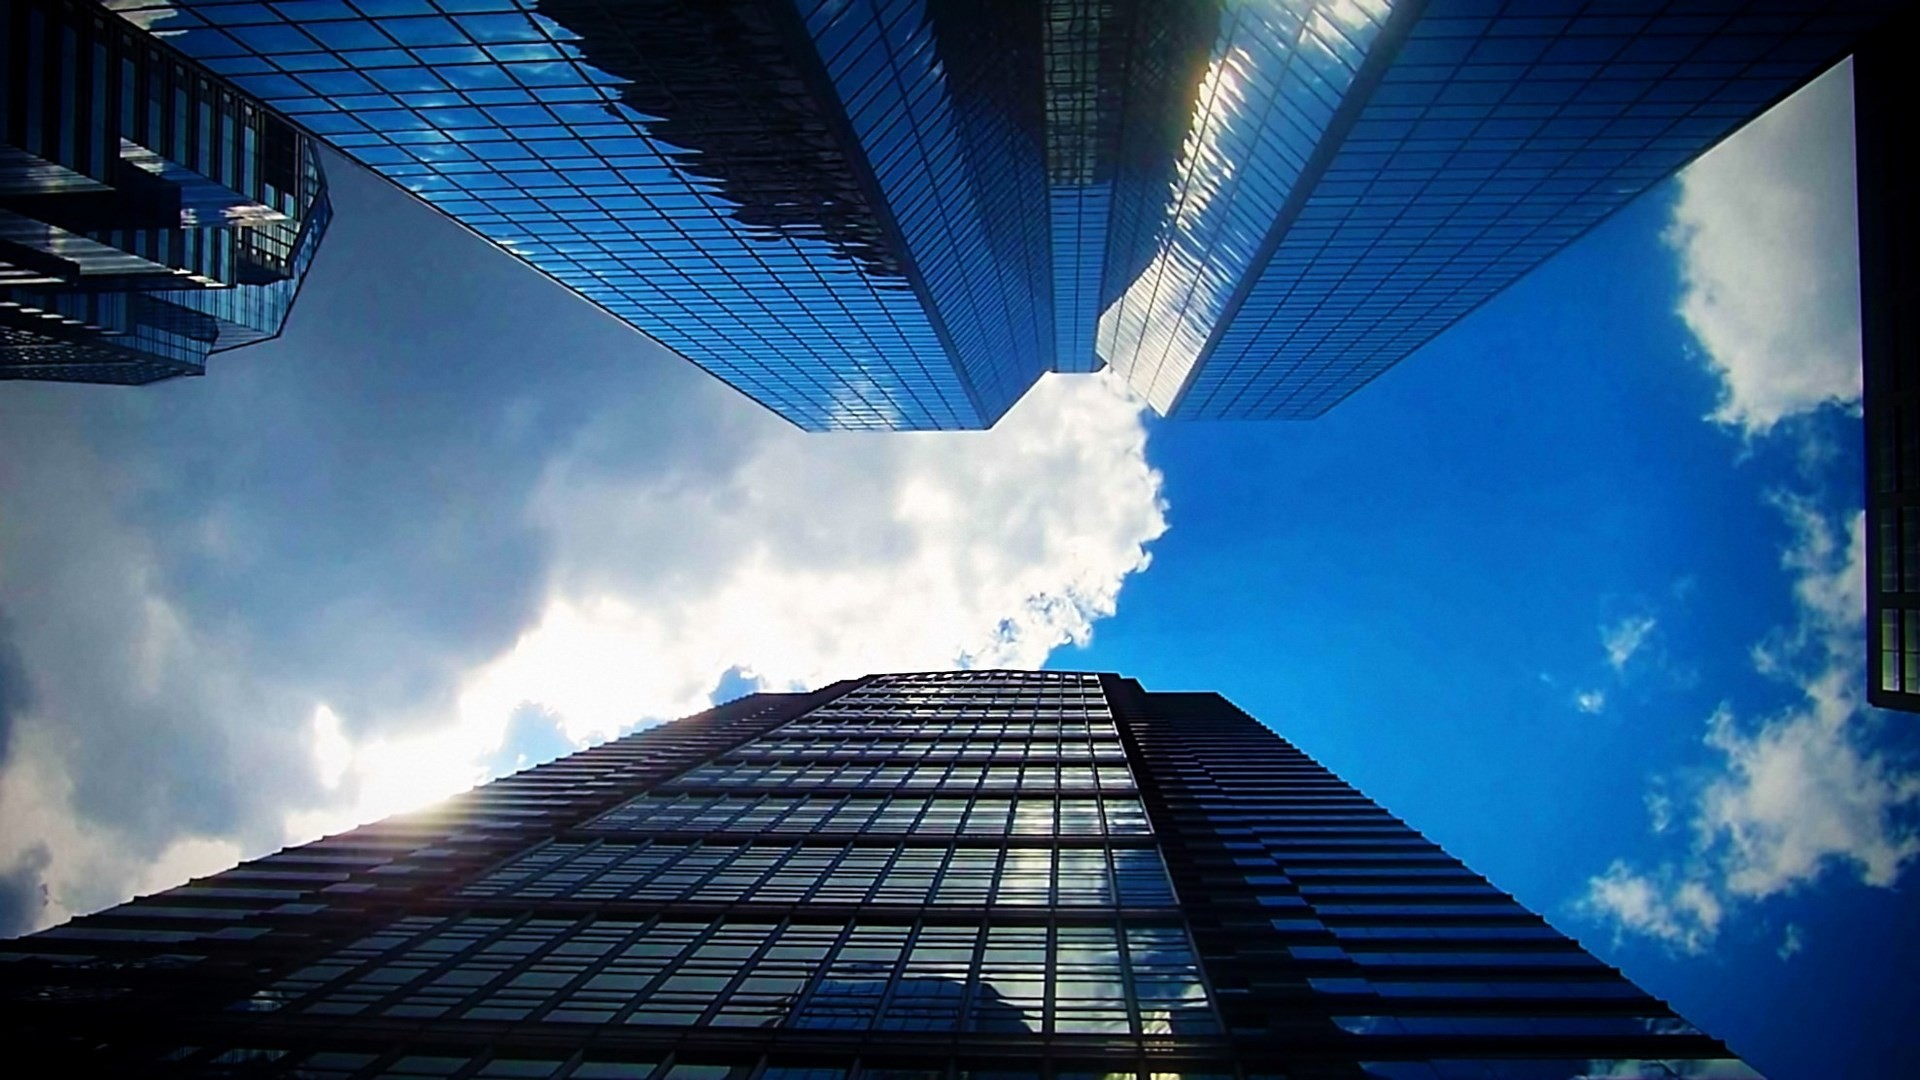 free wallpaper and screensavers for skyscraper